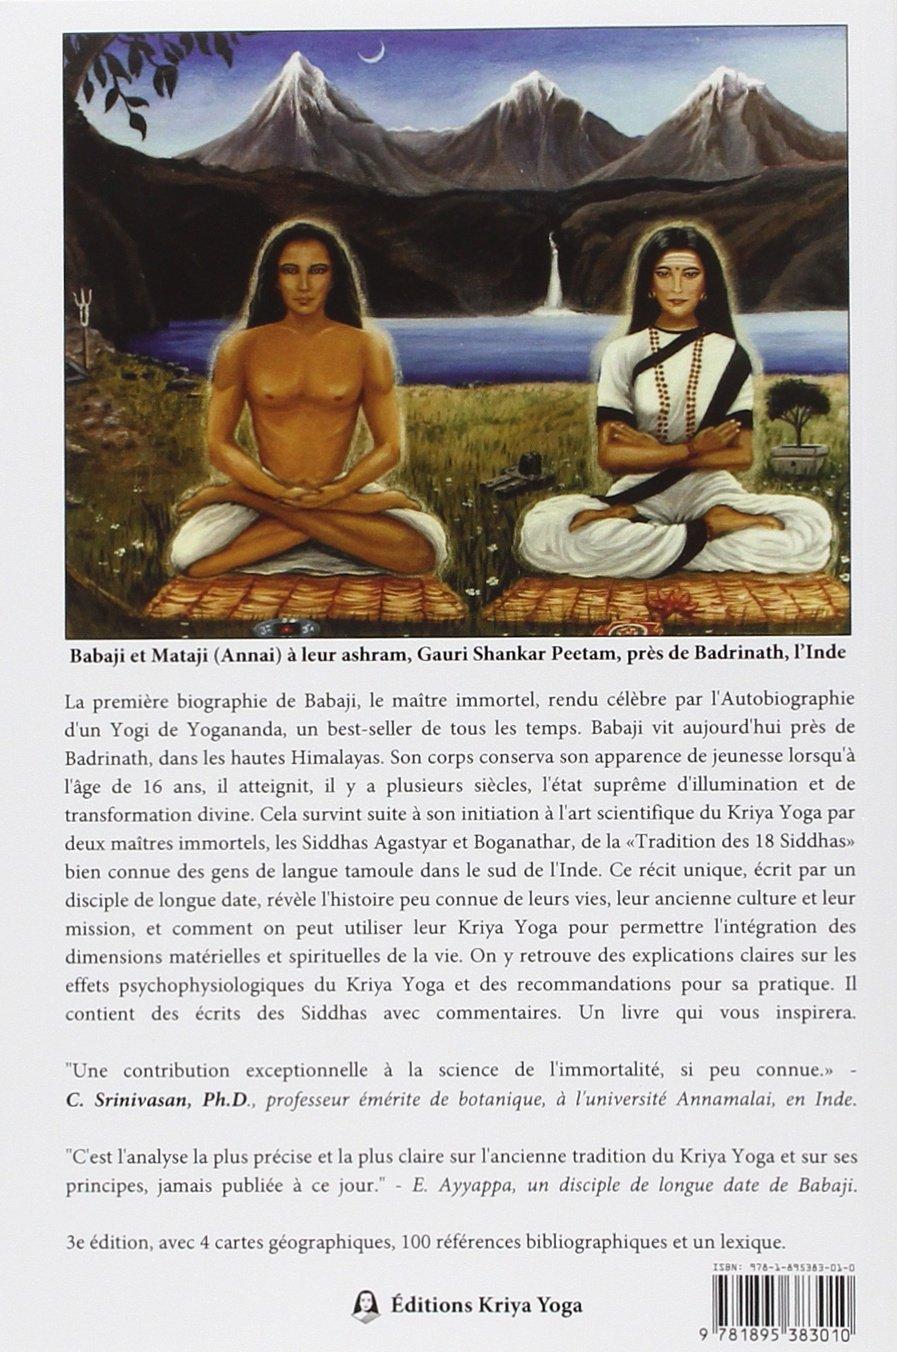 Babaji et la tradition du kriya yoga des 18 siddhas - 3e ...